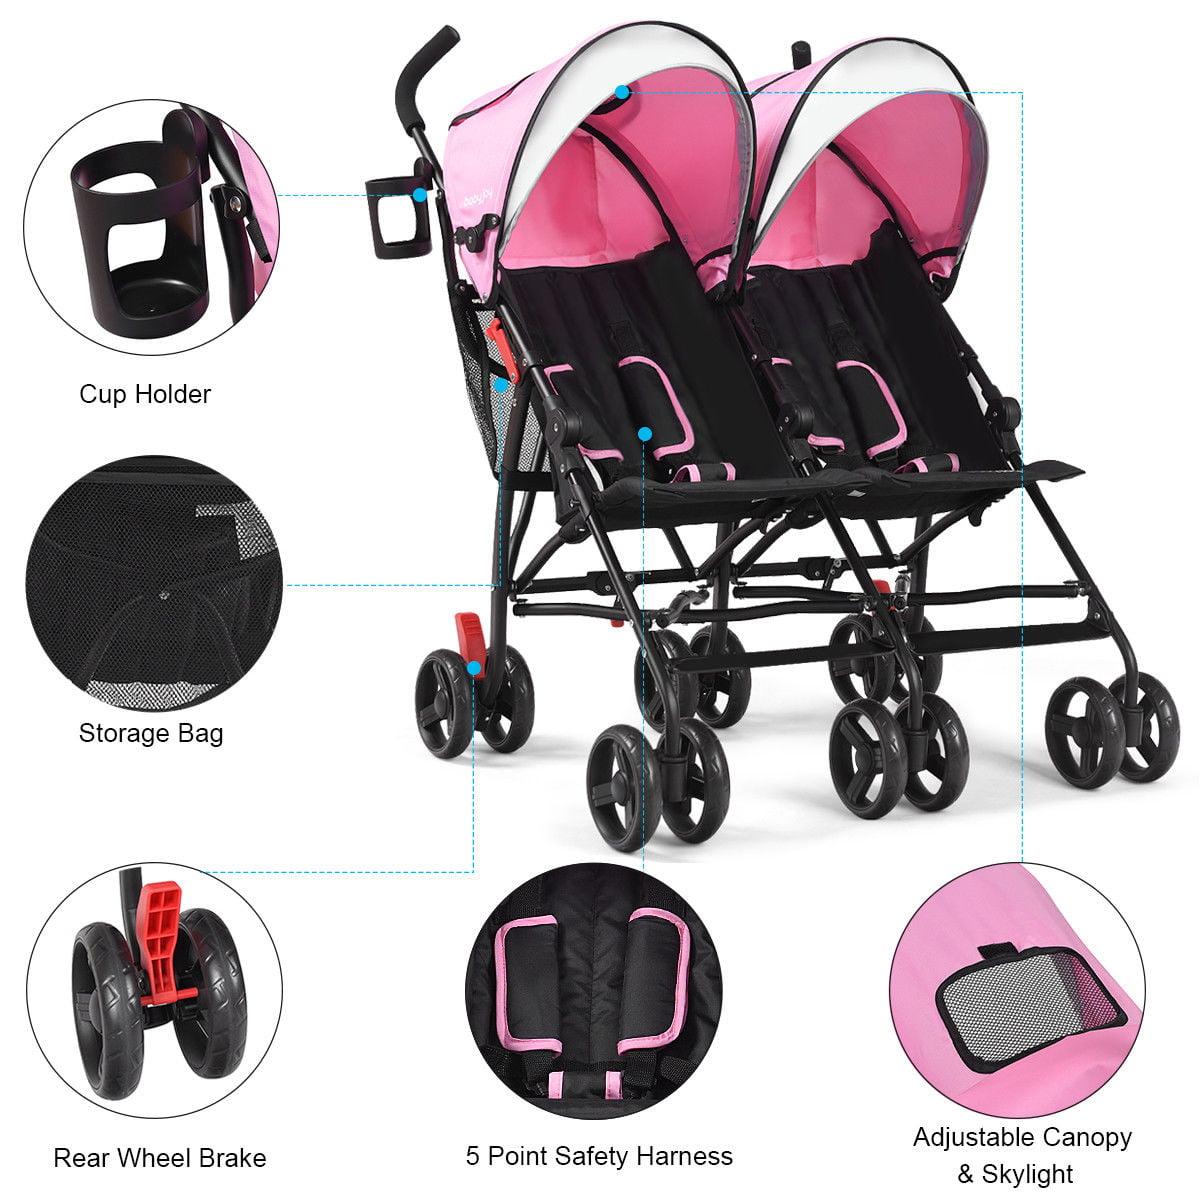 Baby-joy Foldable Twin Baby Double Stroller Kids Ultralight Umbrella Stroller Pushchair